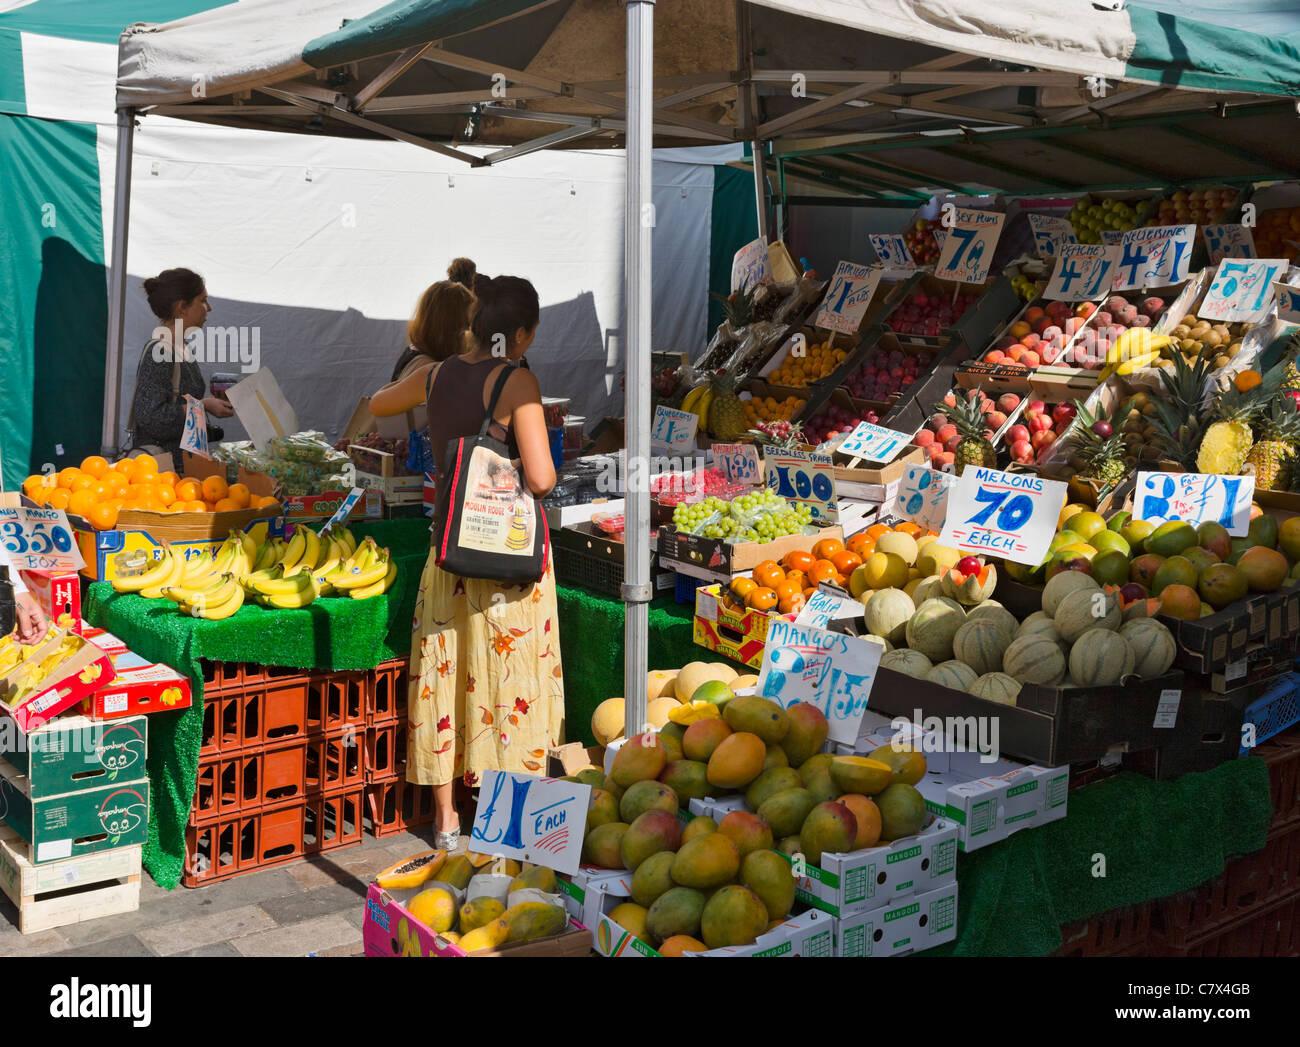 Étal de fruits à Inverness Street Market, Camden Town, au nord de Londres, Angleterre, RU Photo Stock